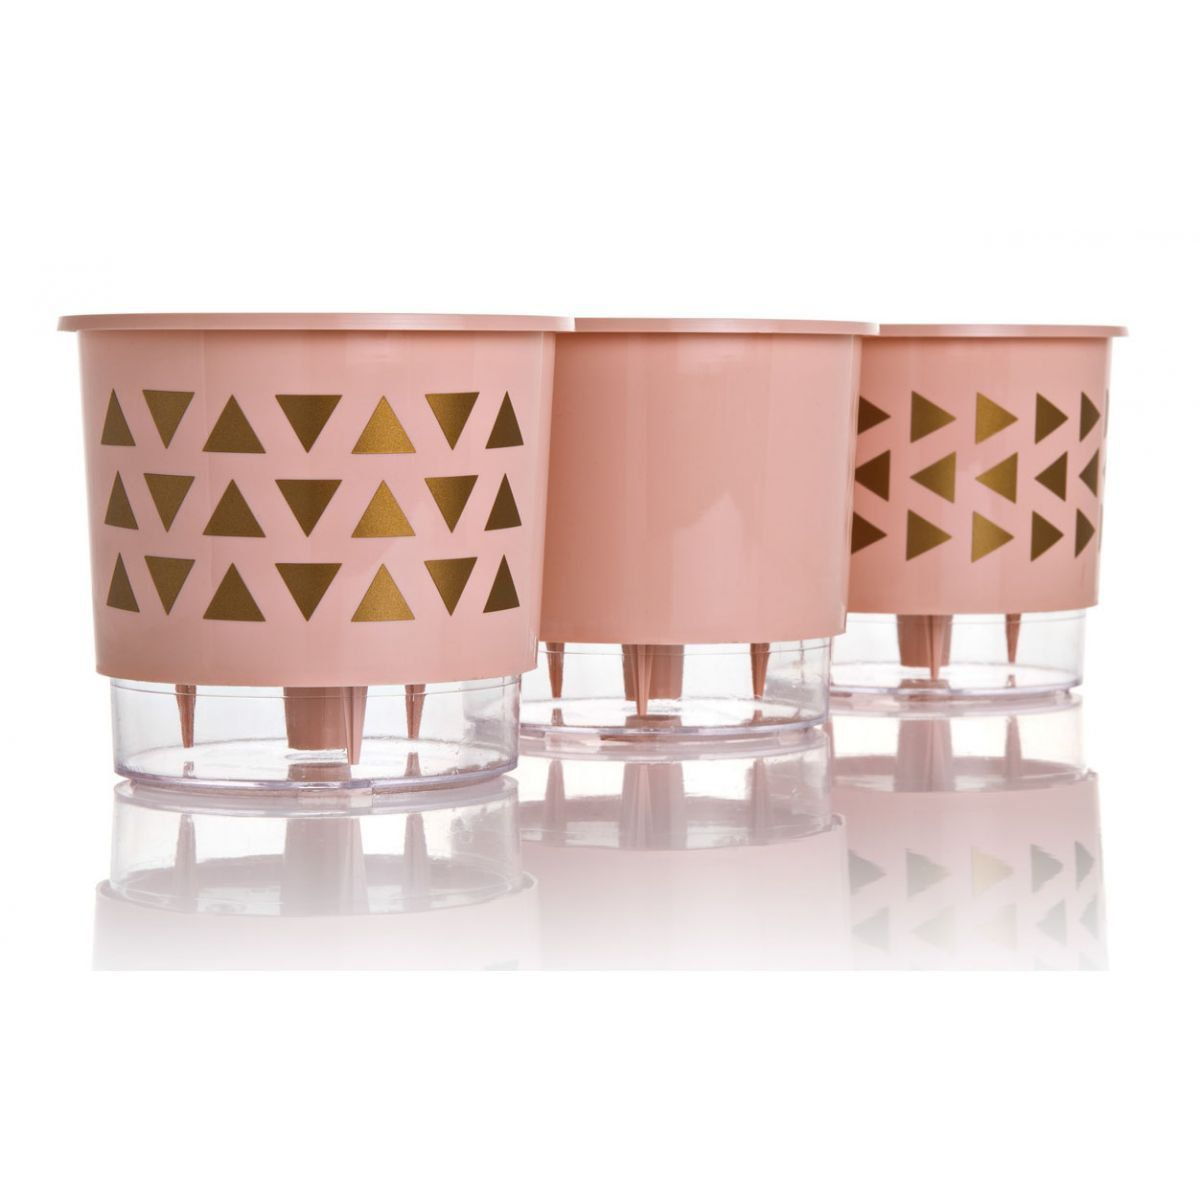 Kit 3 Vasos Autoirrigáveis Pequenos N02 12 cm x 11 cm Geométricos Rosa Quartzo